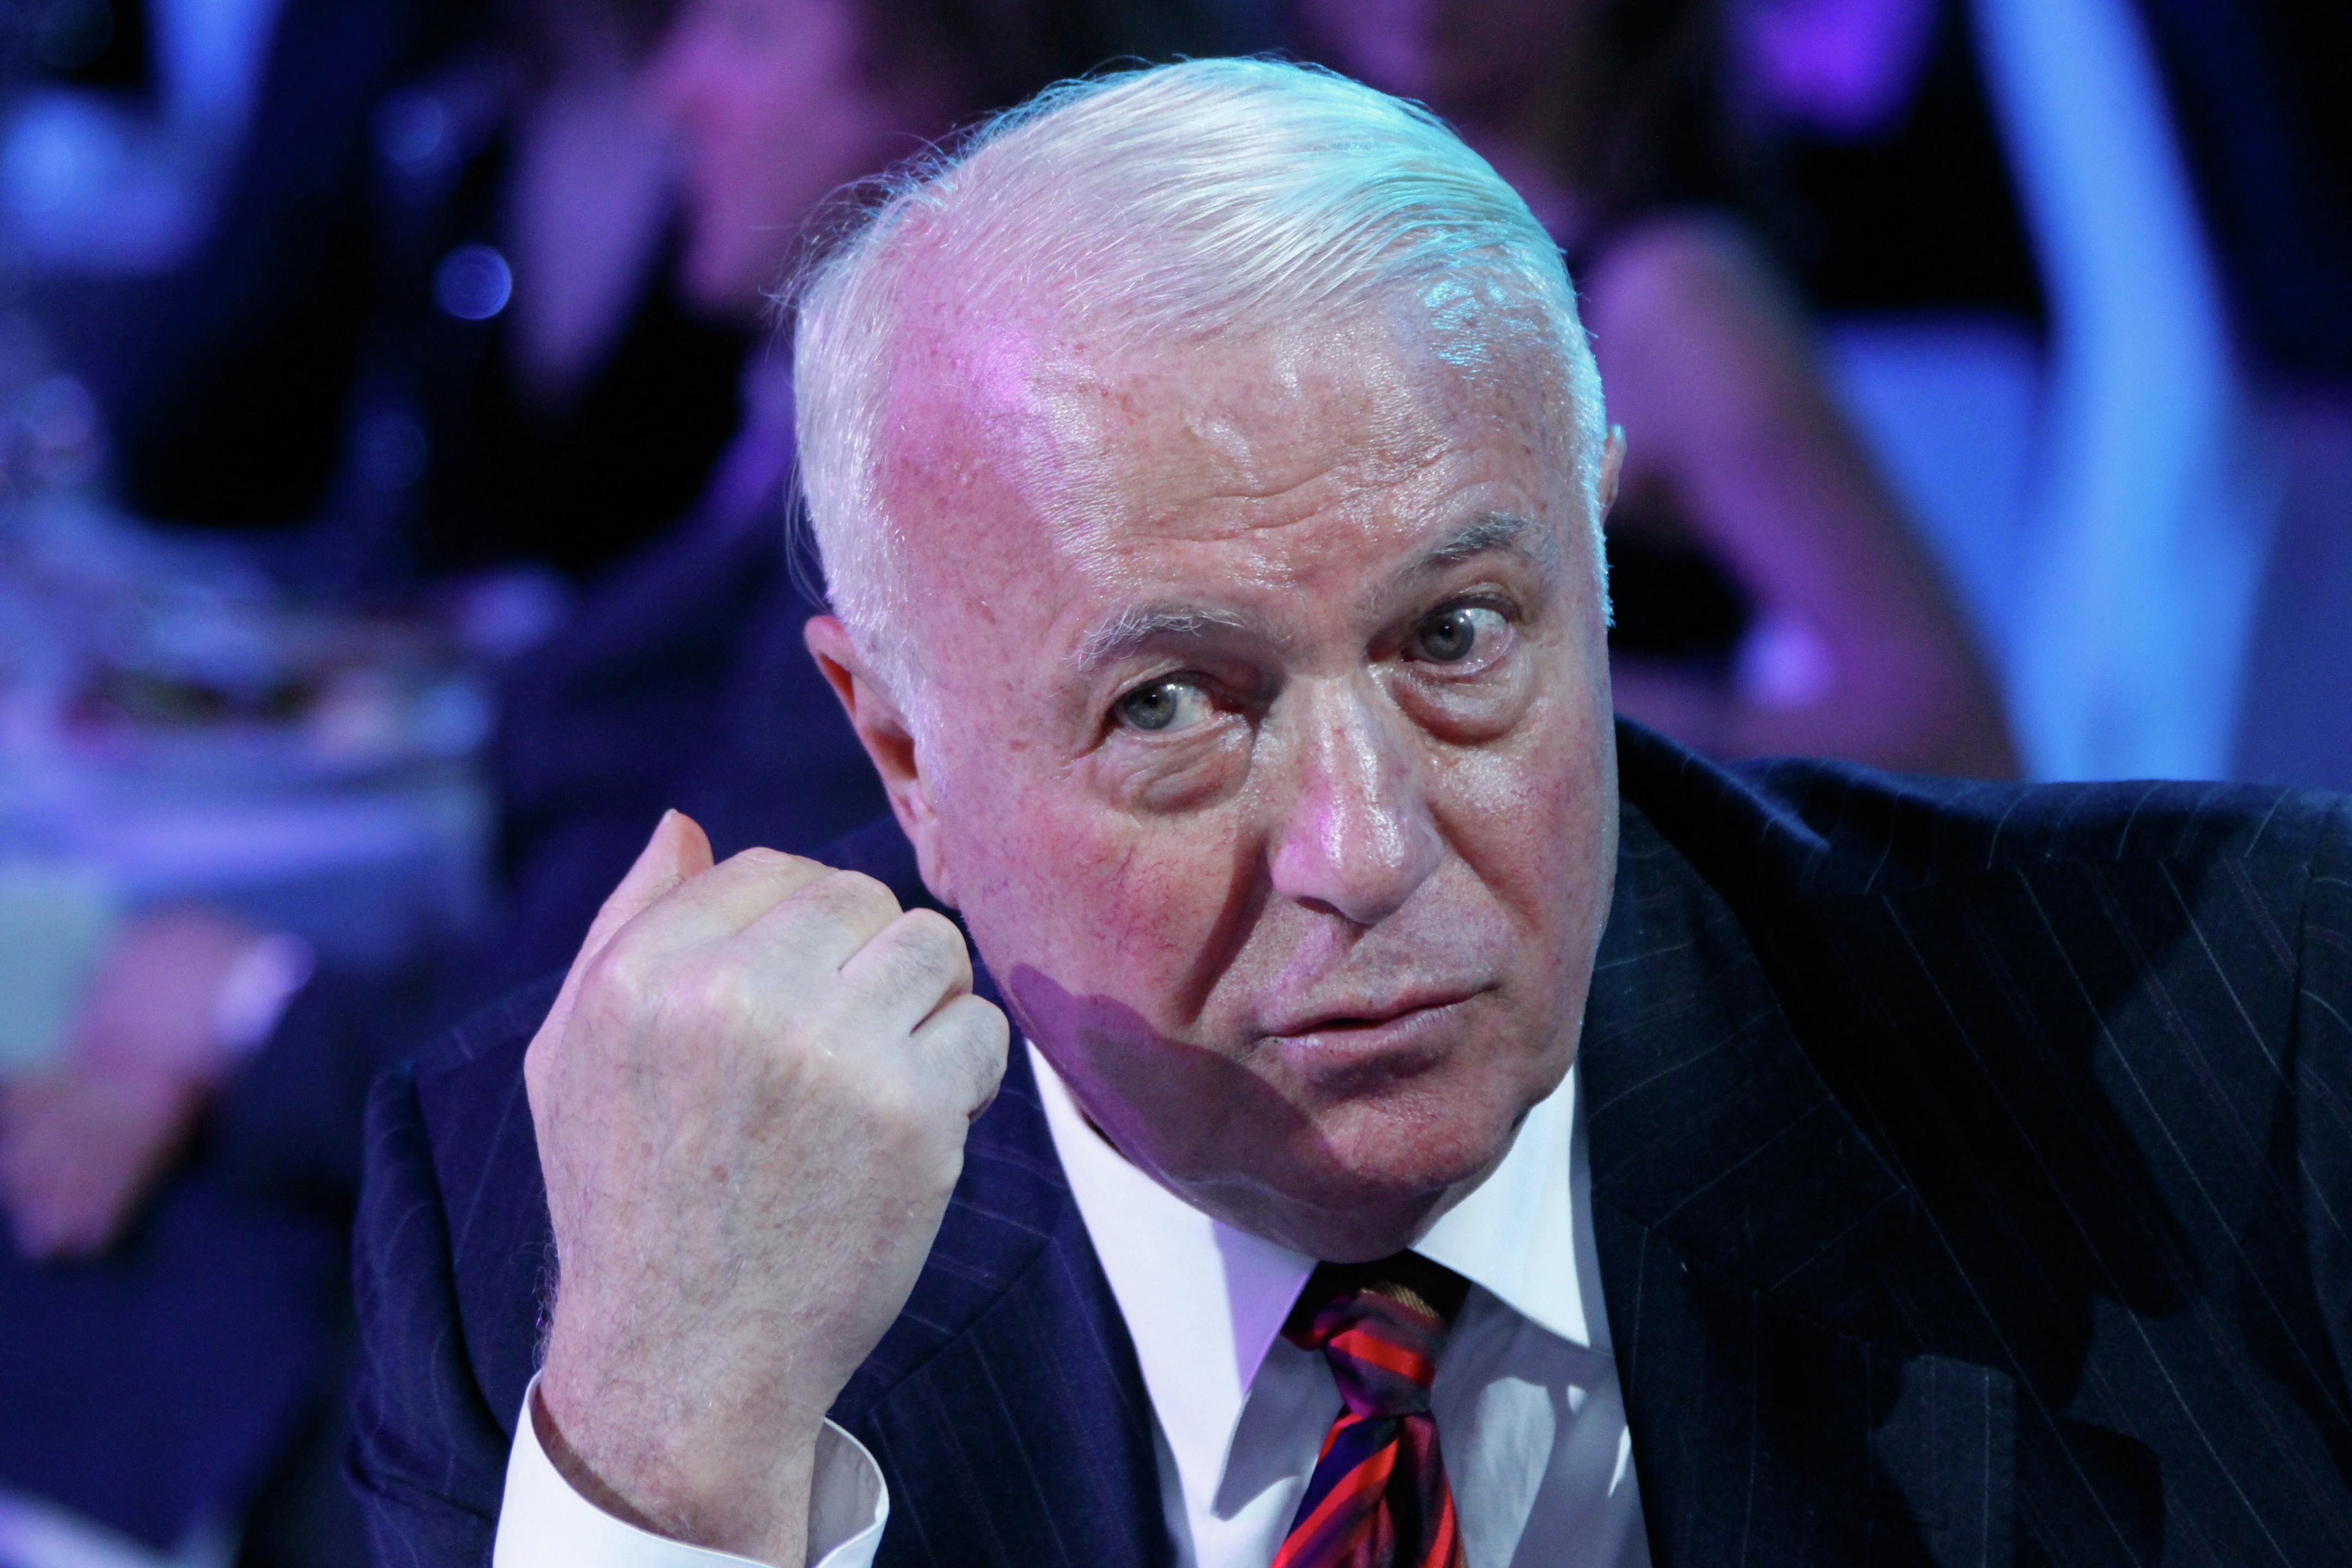 <p>Телеведущий Борис Ноткин. Фото: &copy;РИА Новости/Руслан Кривобок</p>